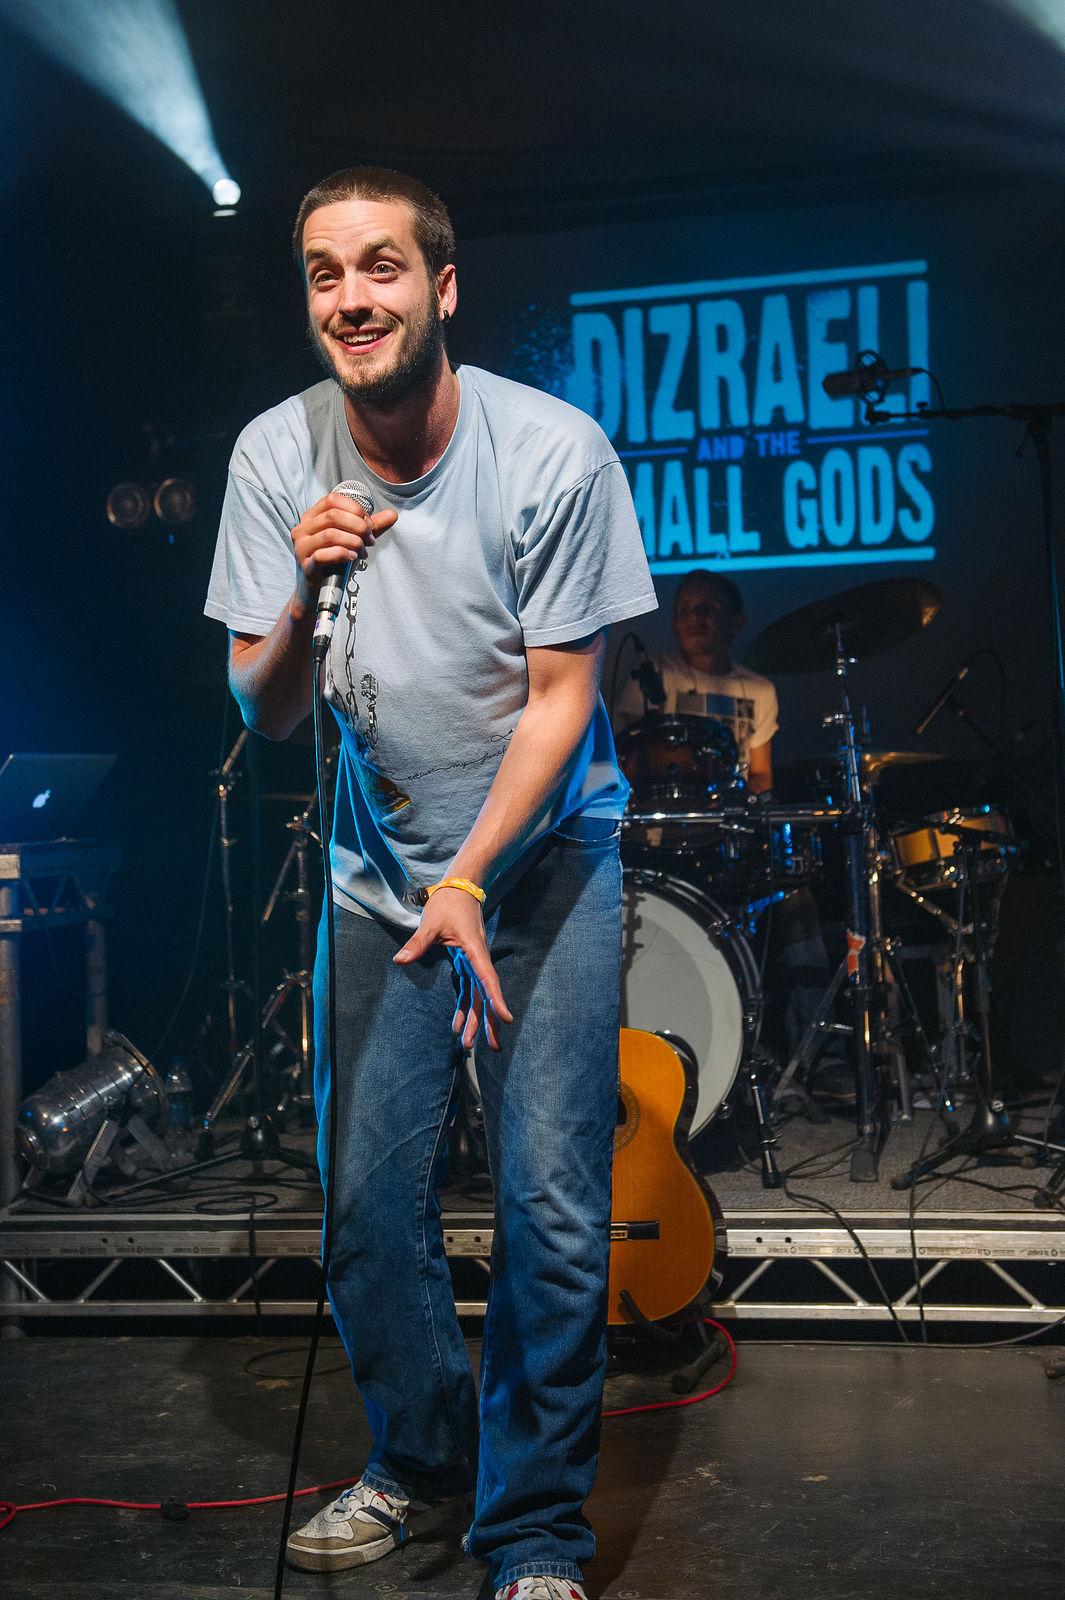 Dizraeli & The Small Gods